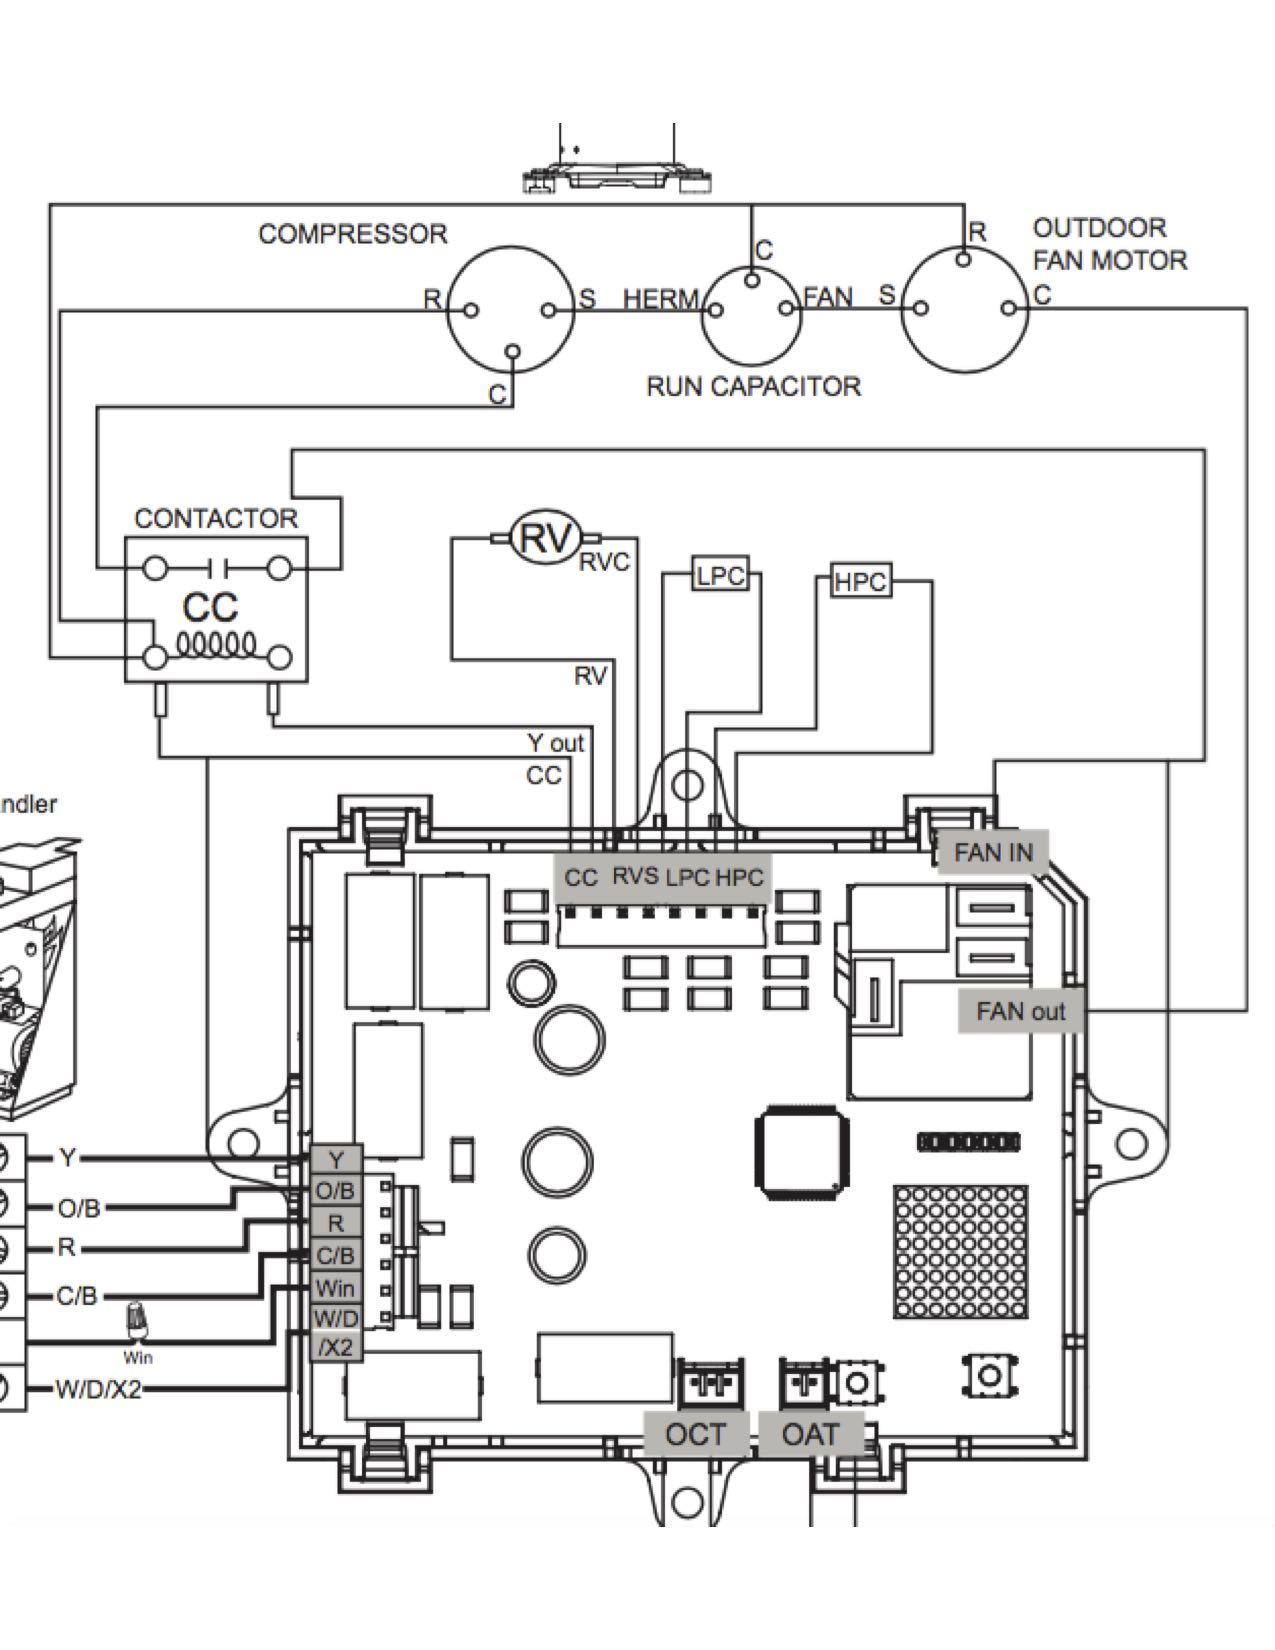 Heat Pump Diagnosis & Defrost Board Replacement Question | DIY Home  Improvement Forum | Hvac Defrost Wiring Connection Diagram |  | DIY Chatroom